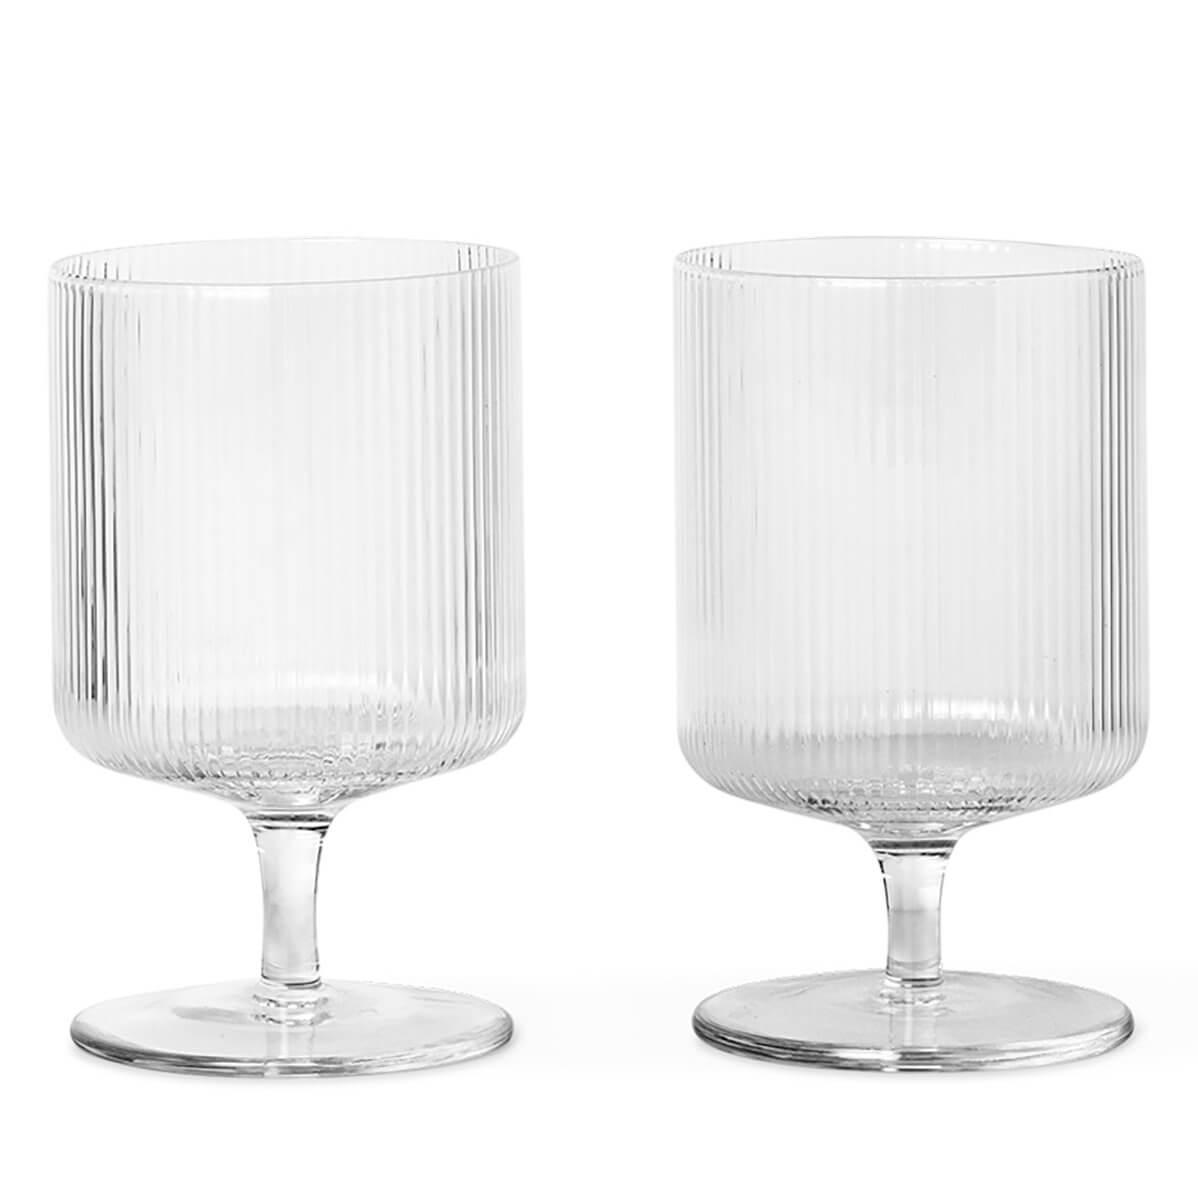 Ferm Living Ripple Wine Glasses - Clear (Set of 2)